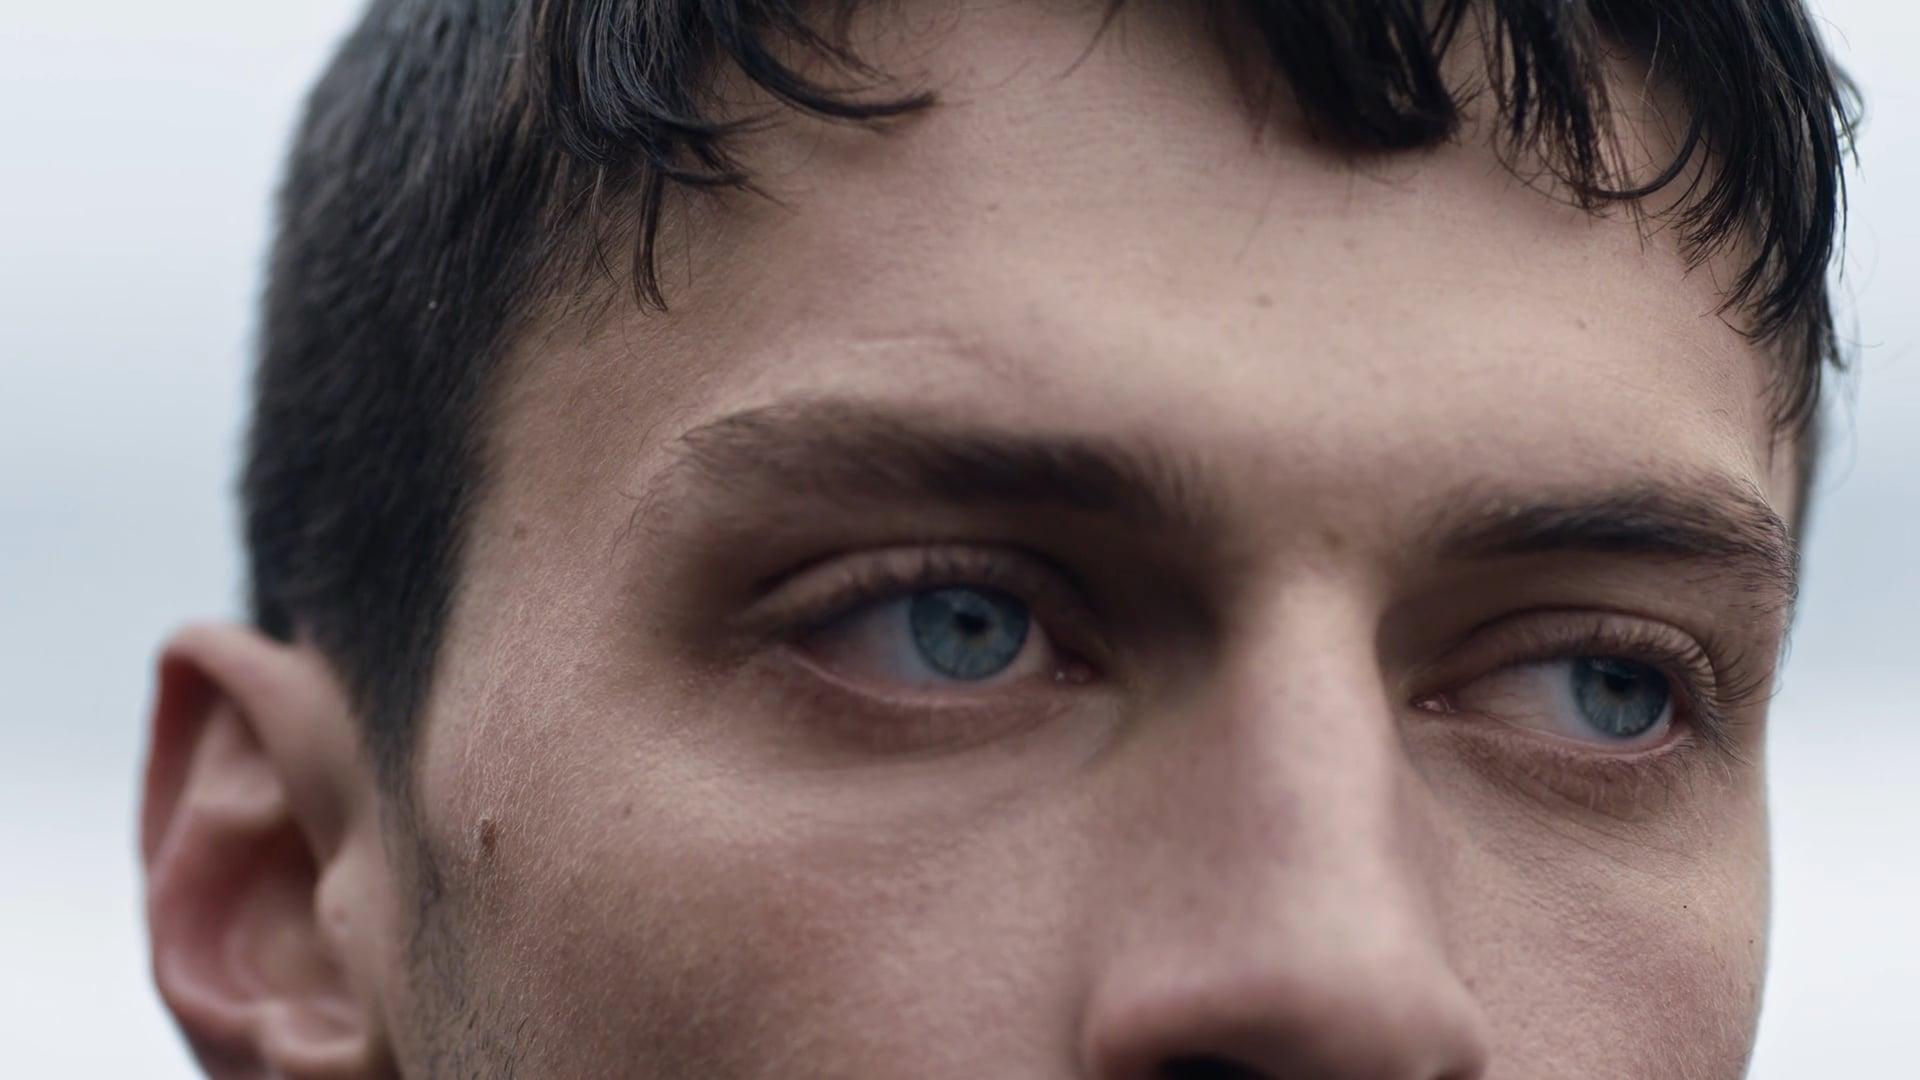 River Island x Mathew Miller // Production Company Hidden Agency // Director Liam Gleeson